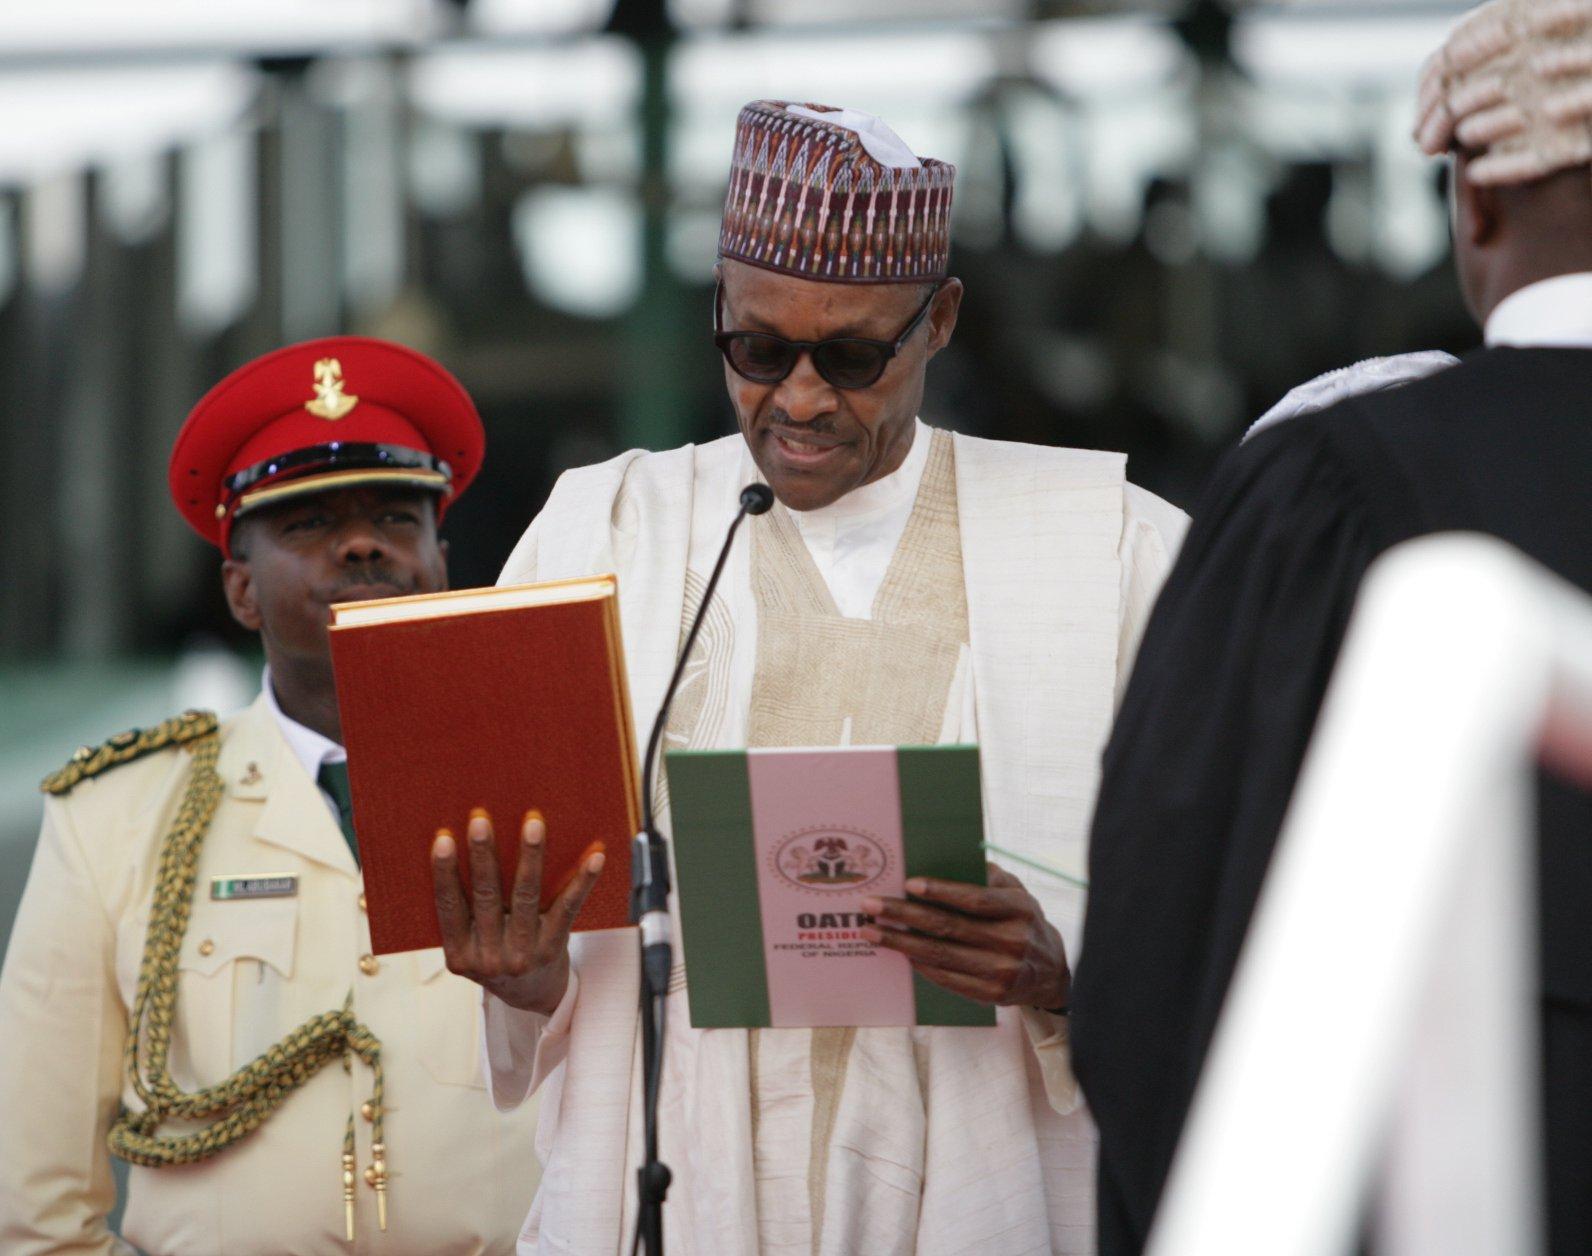 Femi Fani-Kayode Commends Past Leaders For Snubbing Buhari's Inauguration